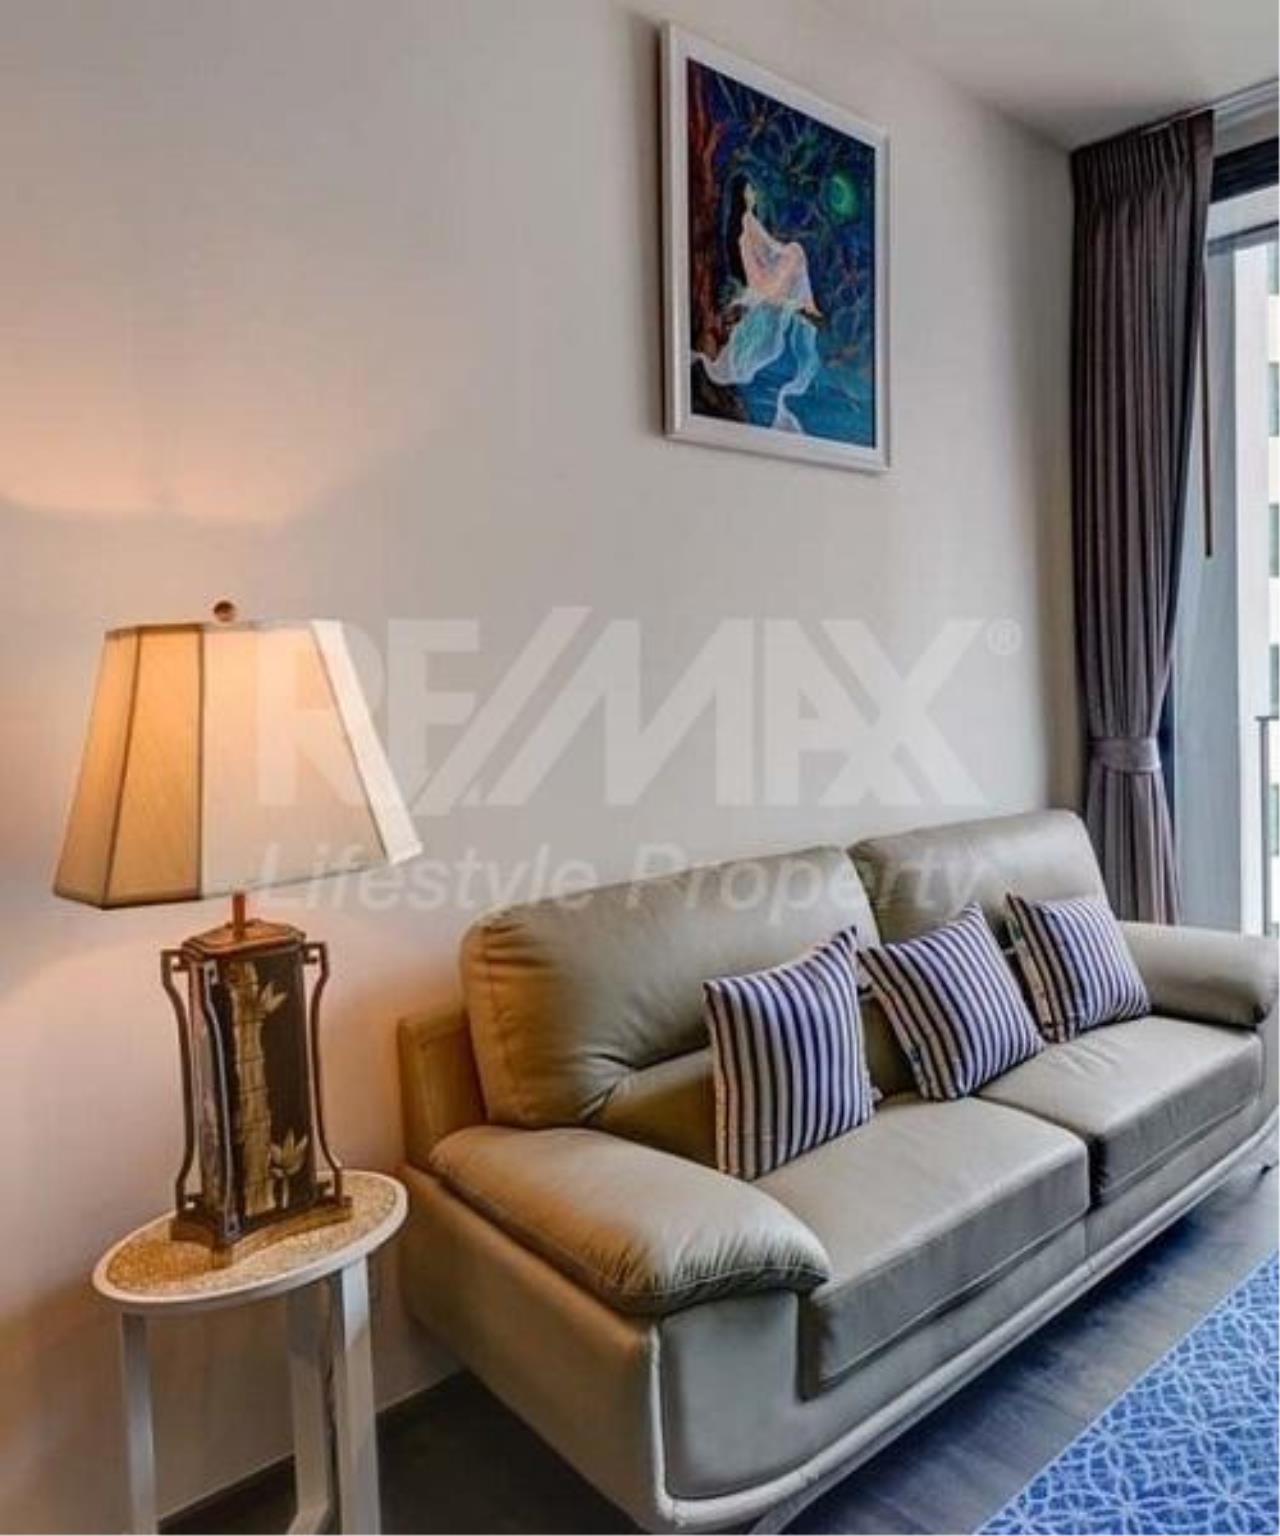 RE/MAX LifeStyle Property Agency's Edge Sukhumvit 23 1